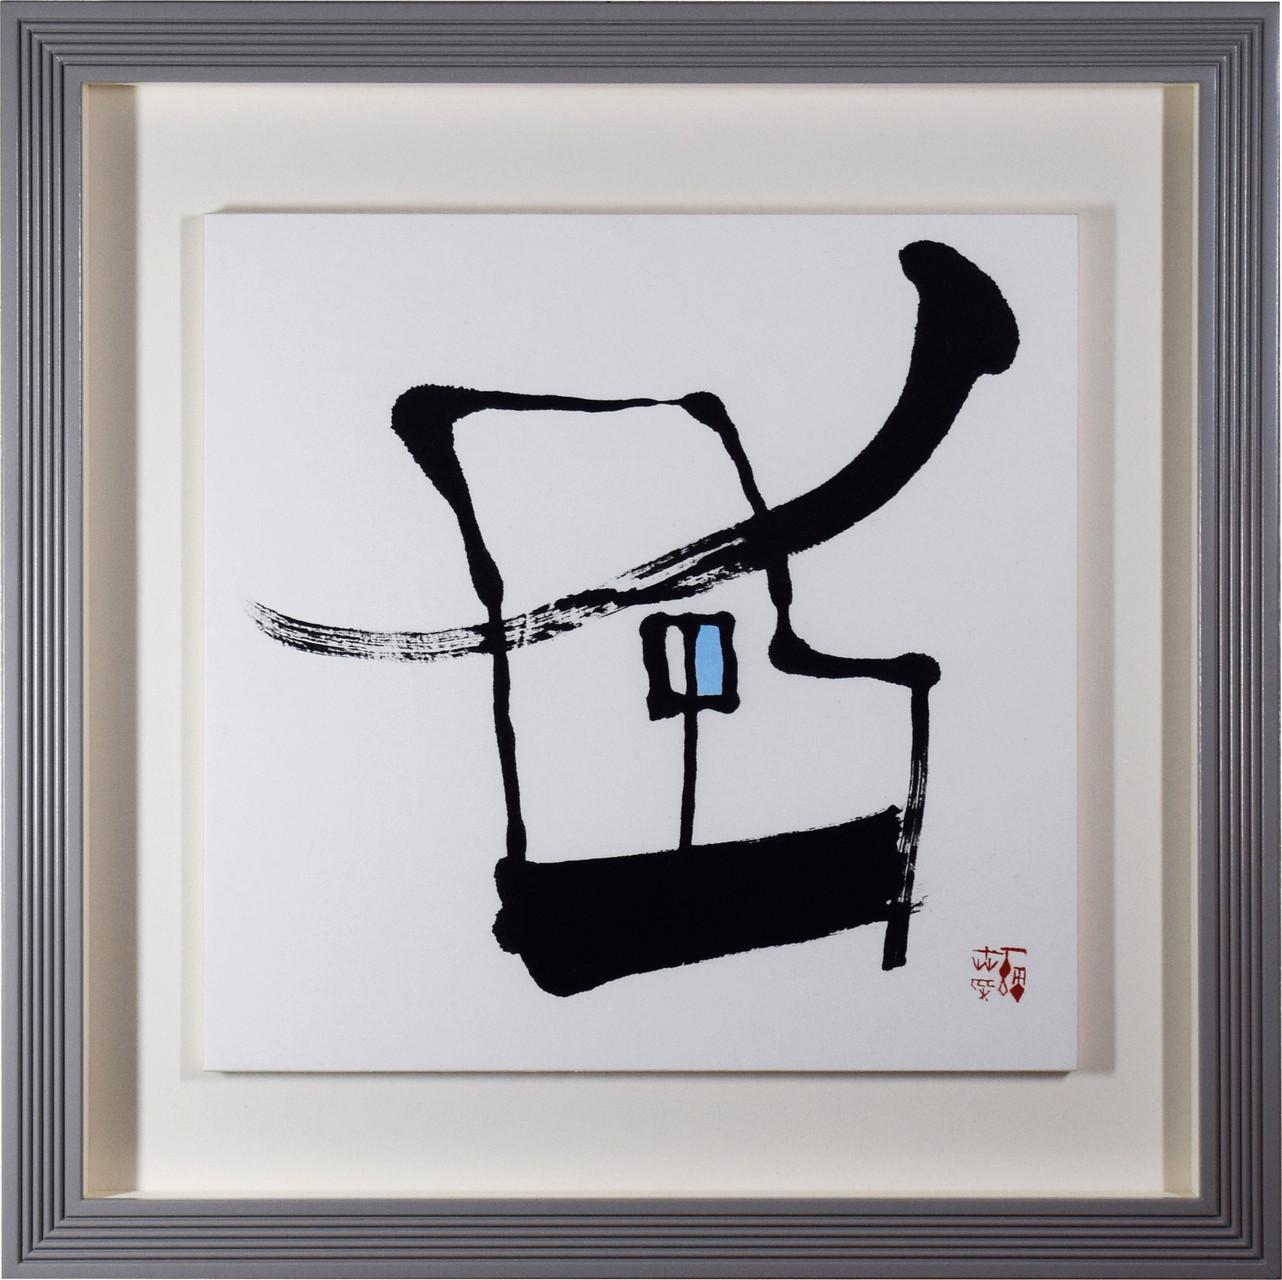 No24.風【墨・水彩】W50×H50cm ¥38,000